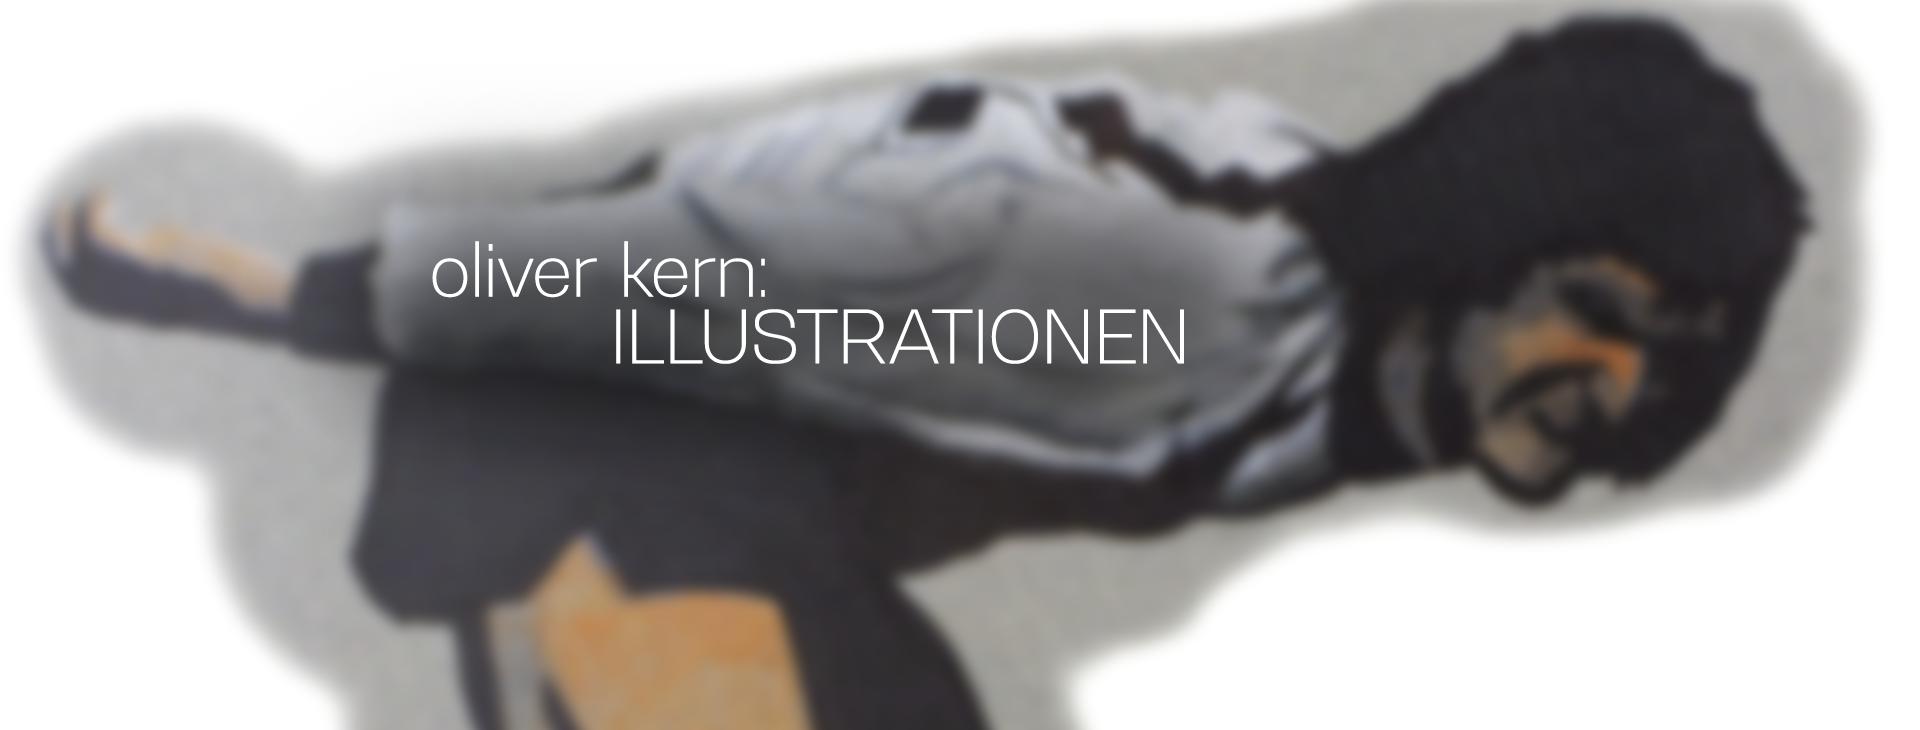 oliver-kern-illustrationen_header_sml